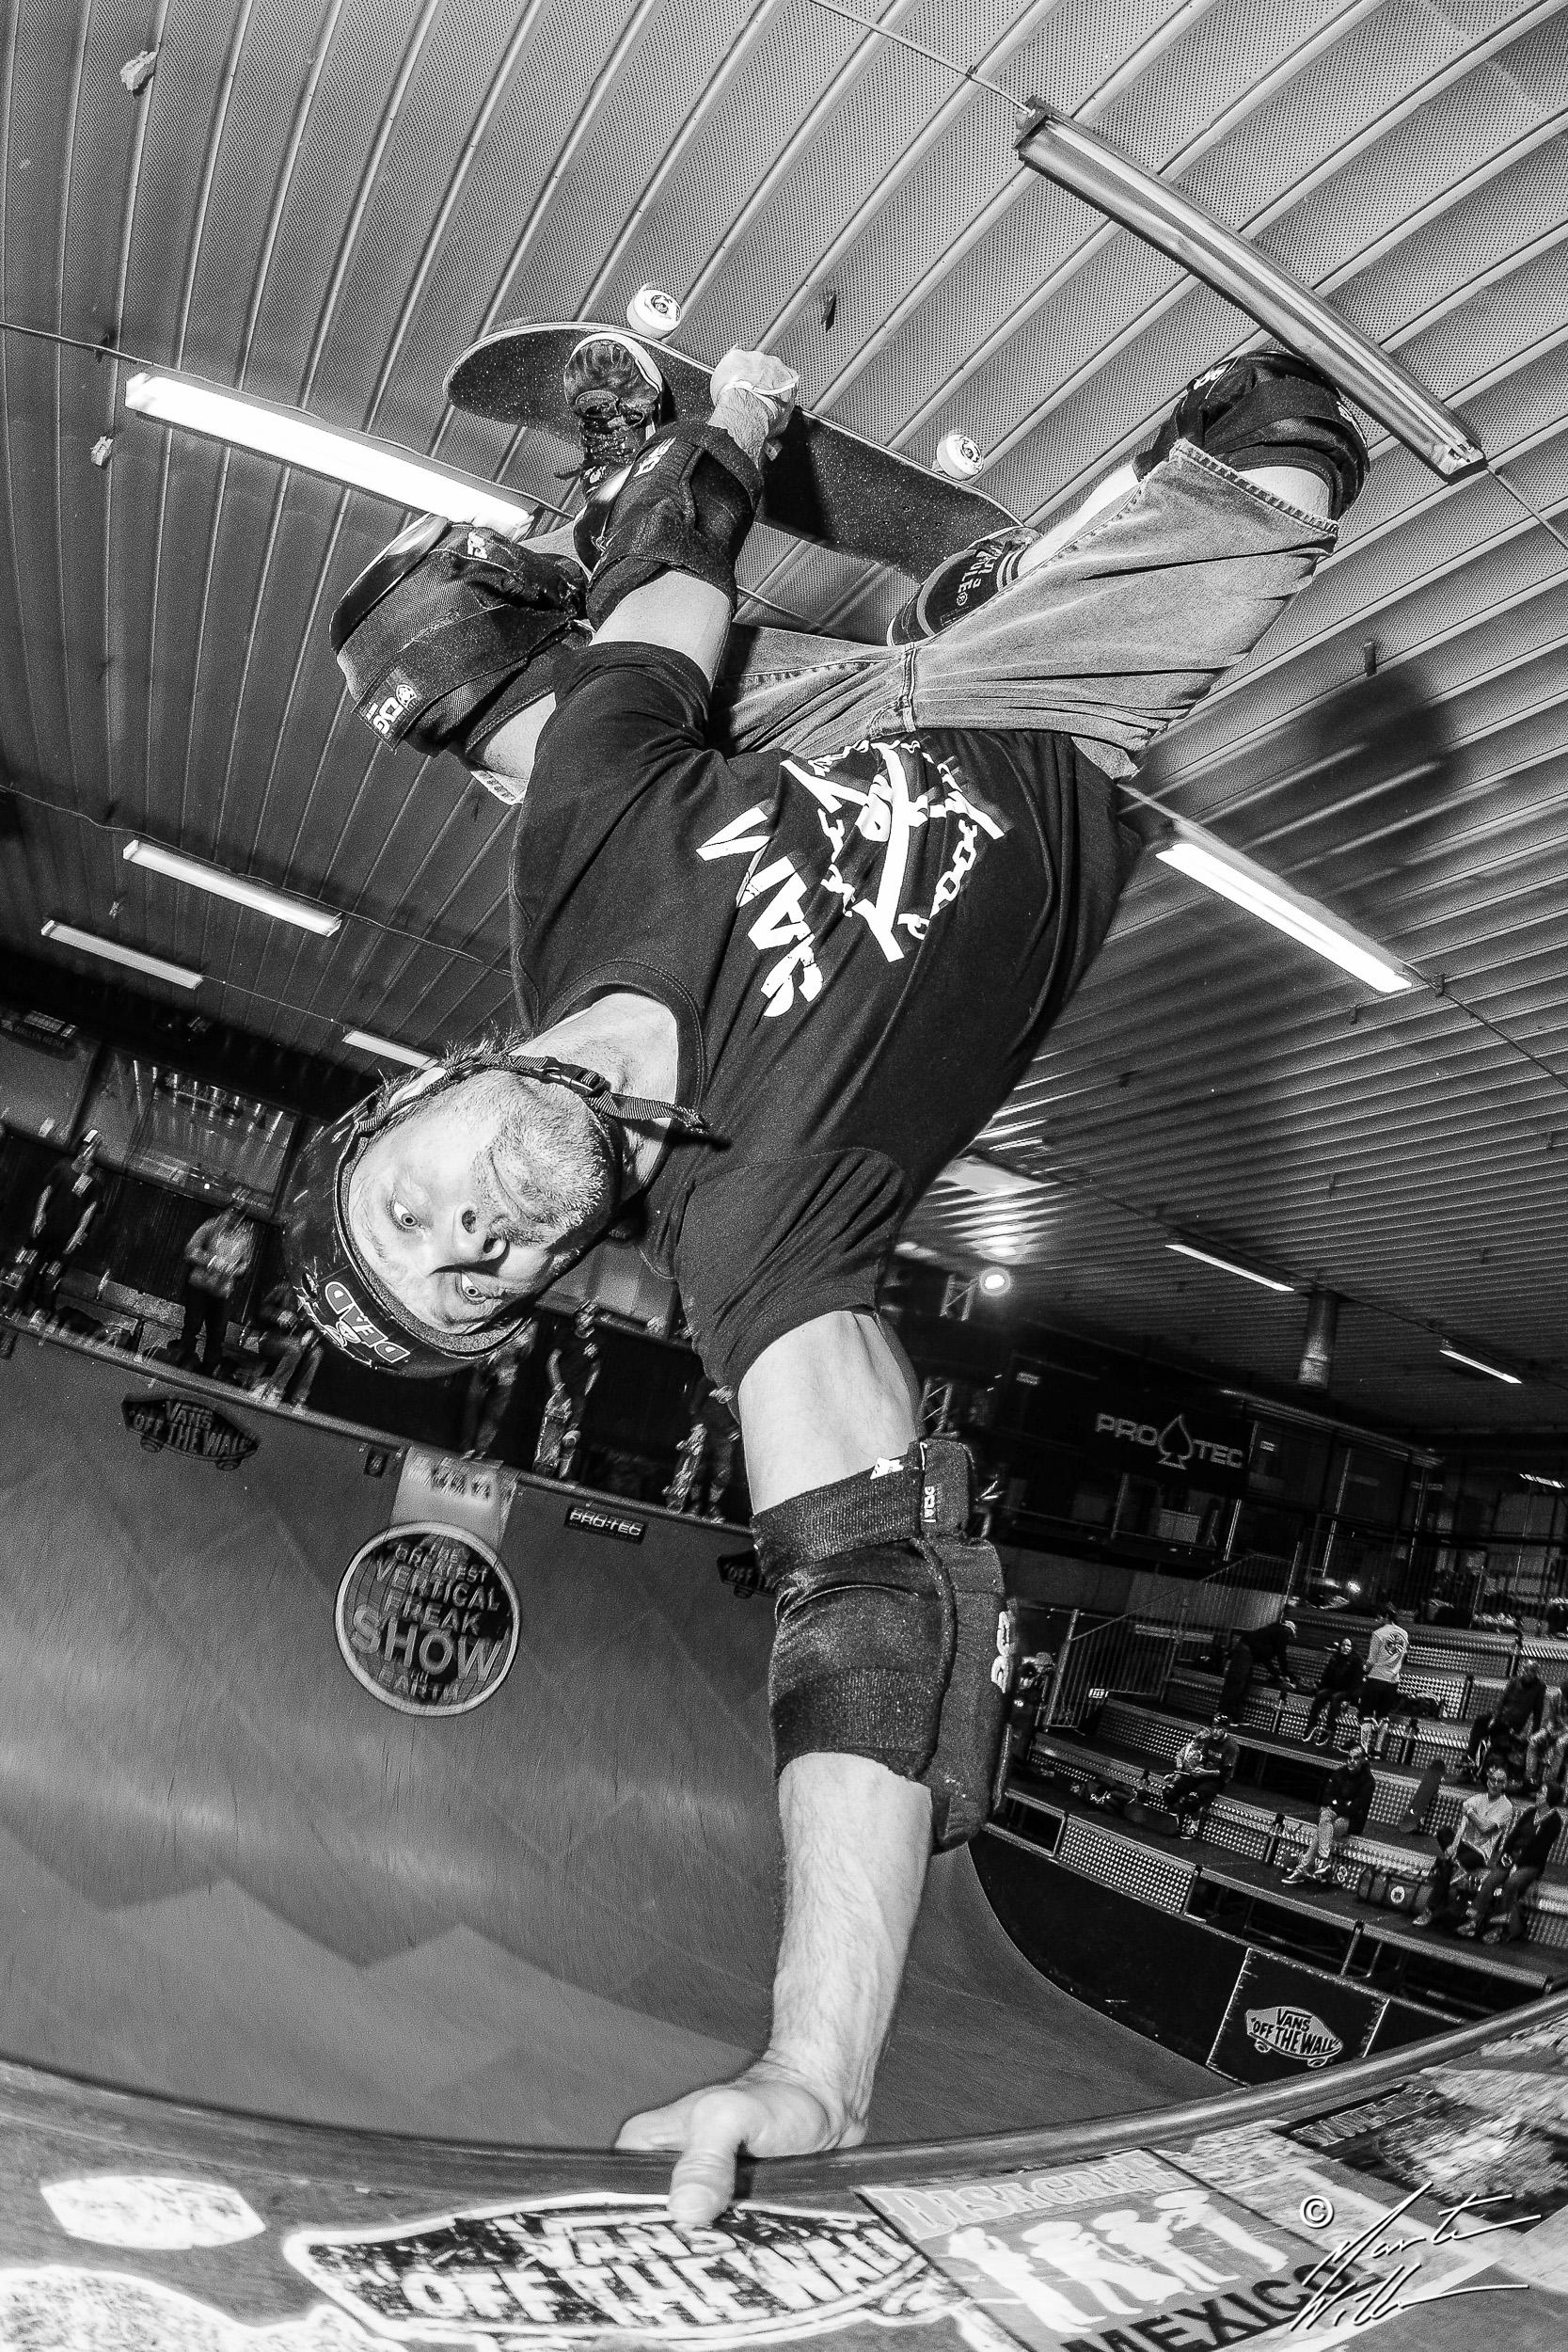 Tony Jansson, handplant, Vert Attack X, Malmö 2016